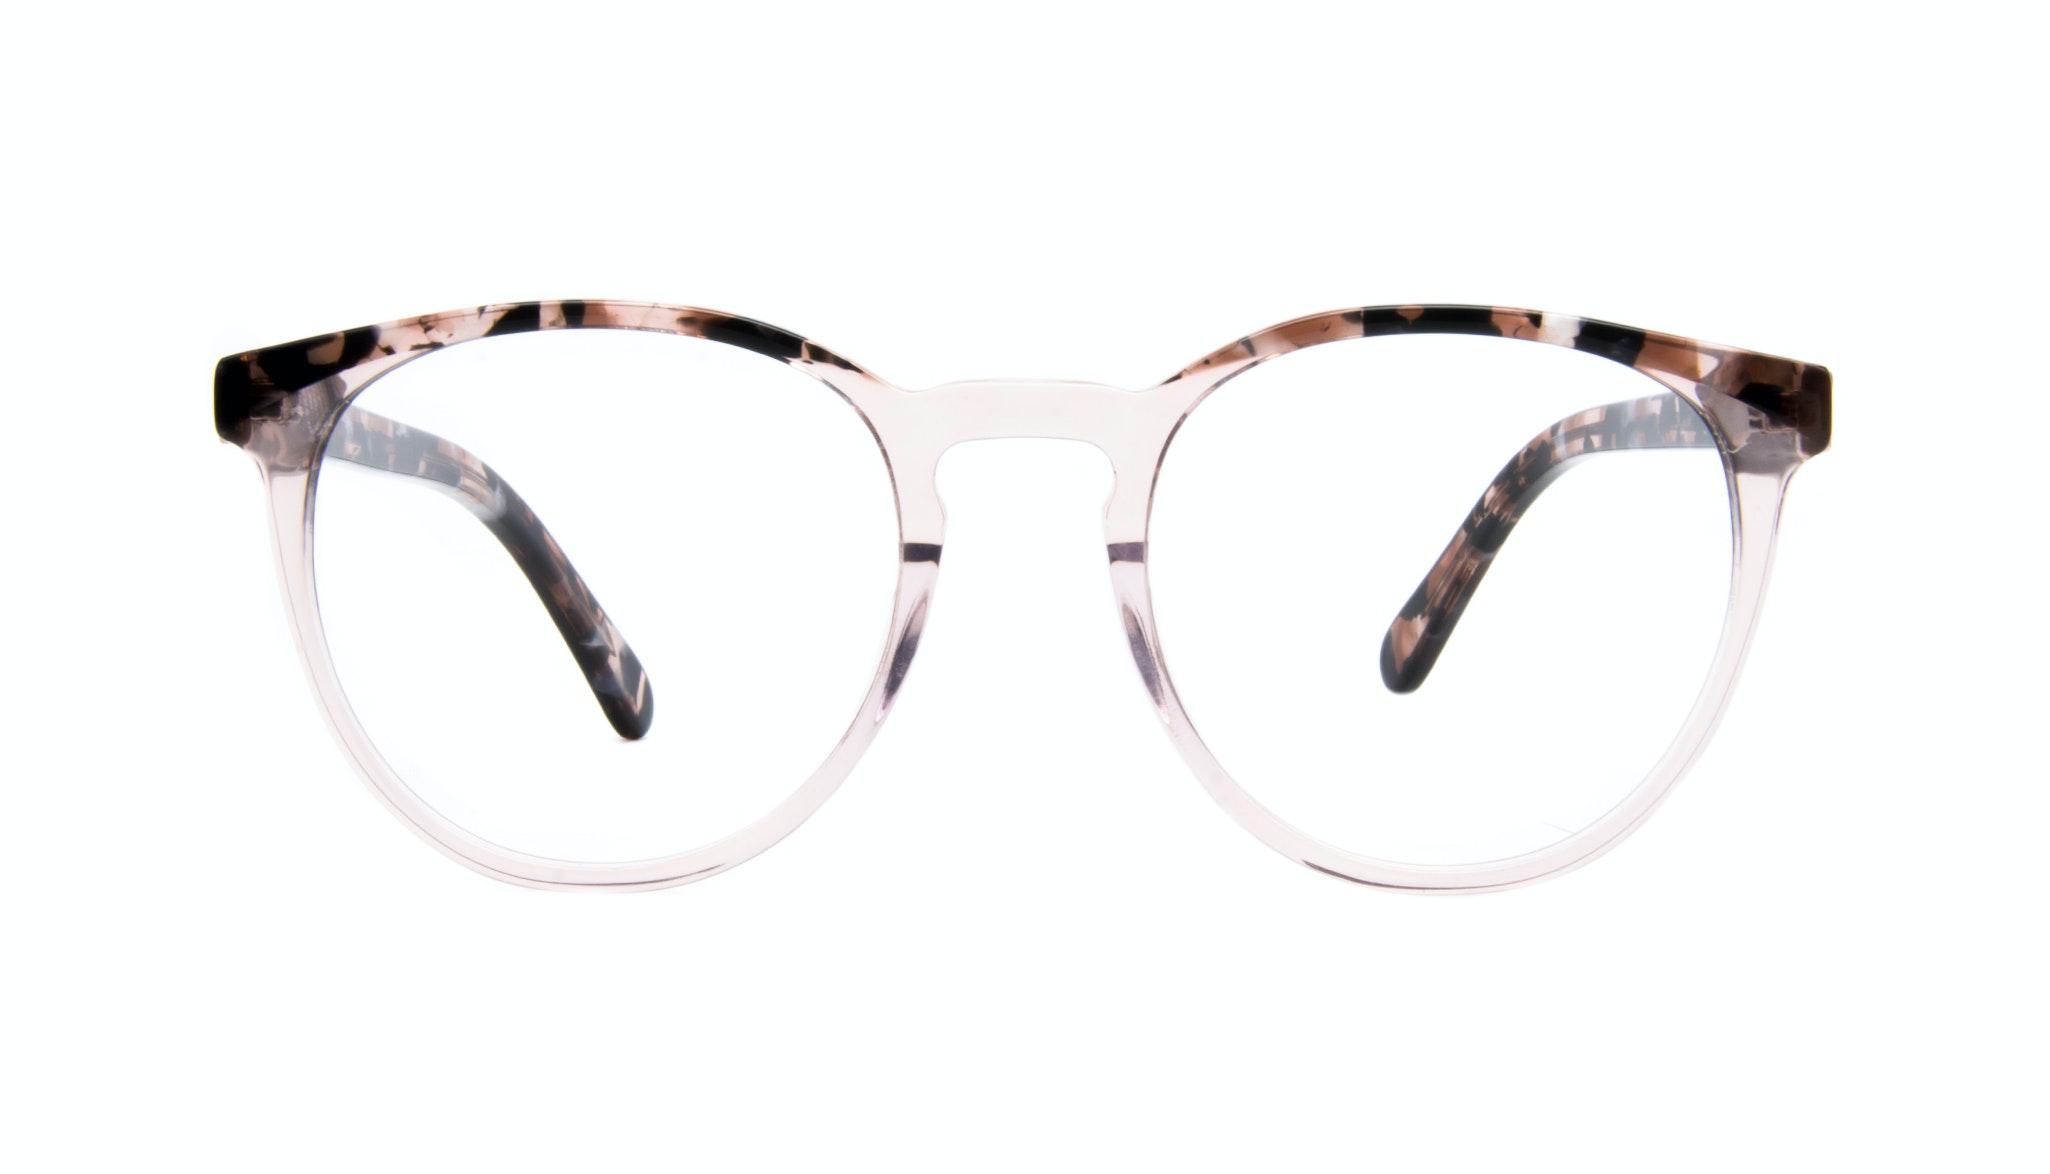 Affordable Fashion Glasses Round Eyeglasses Women Brilliant Rose Tort Front